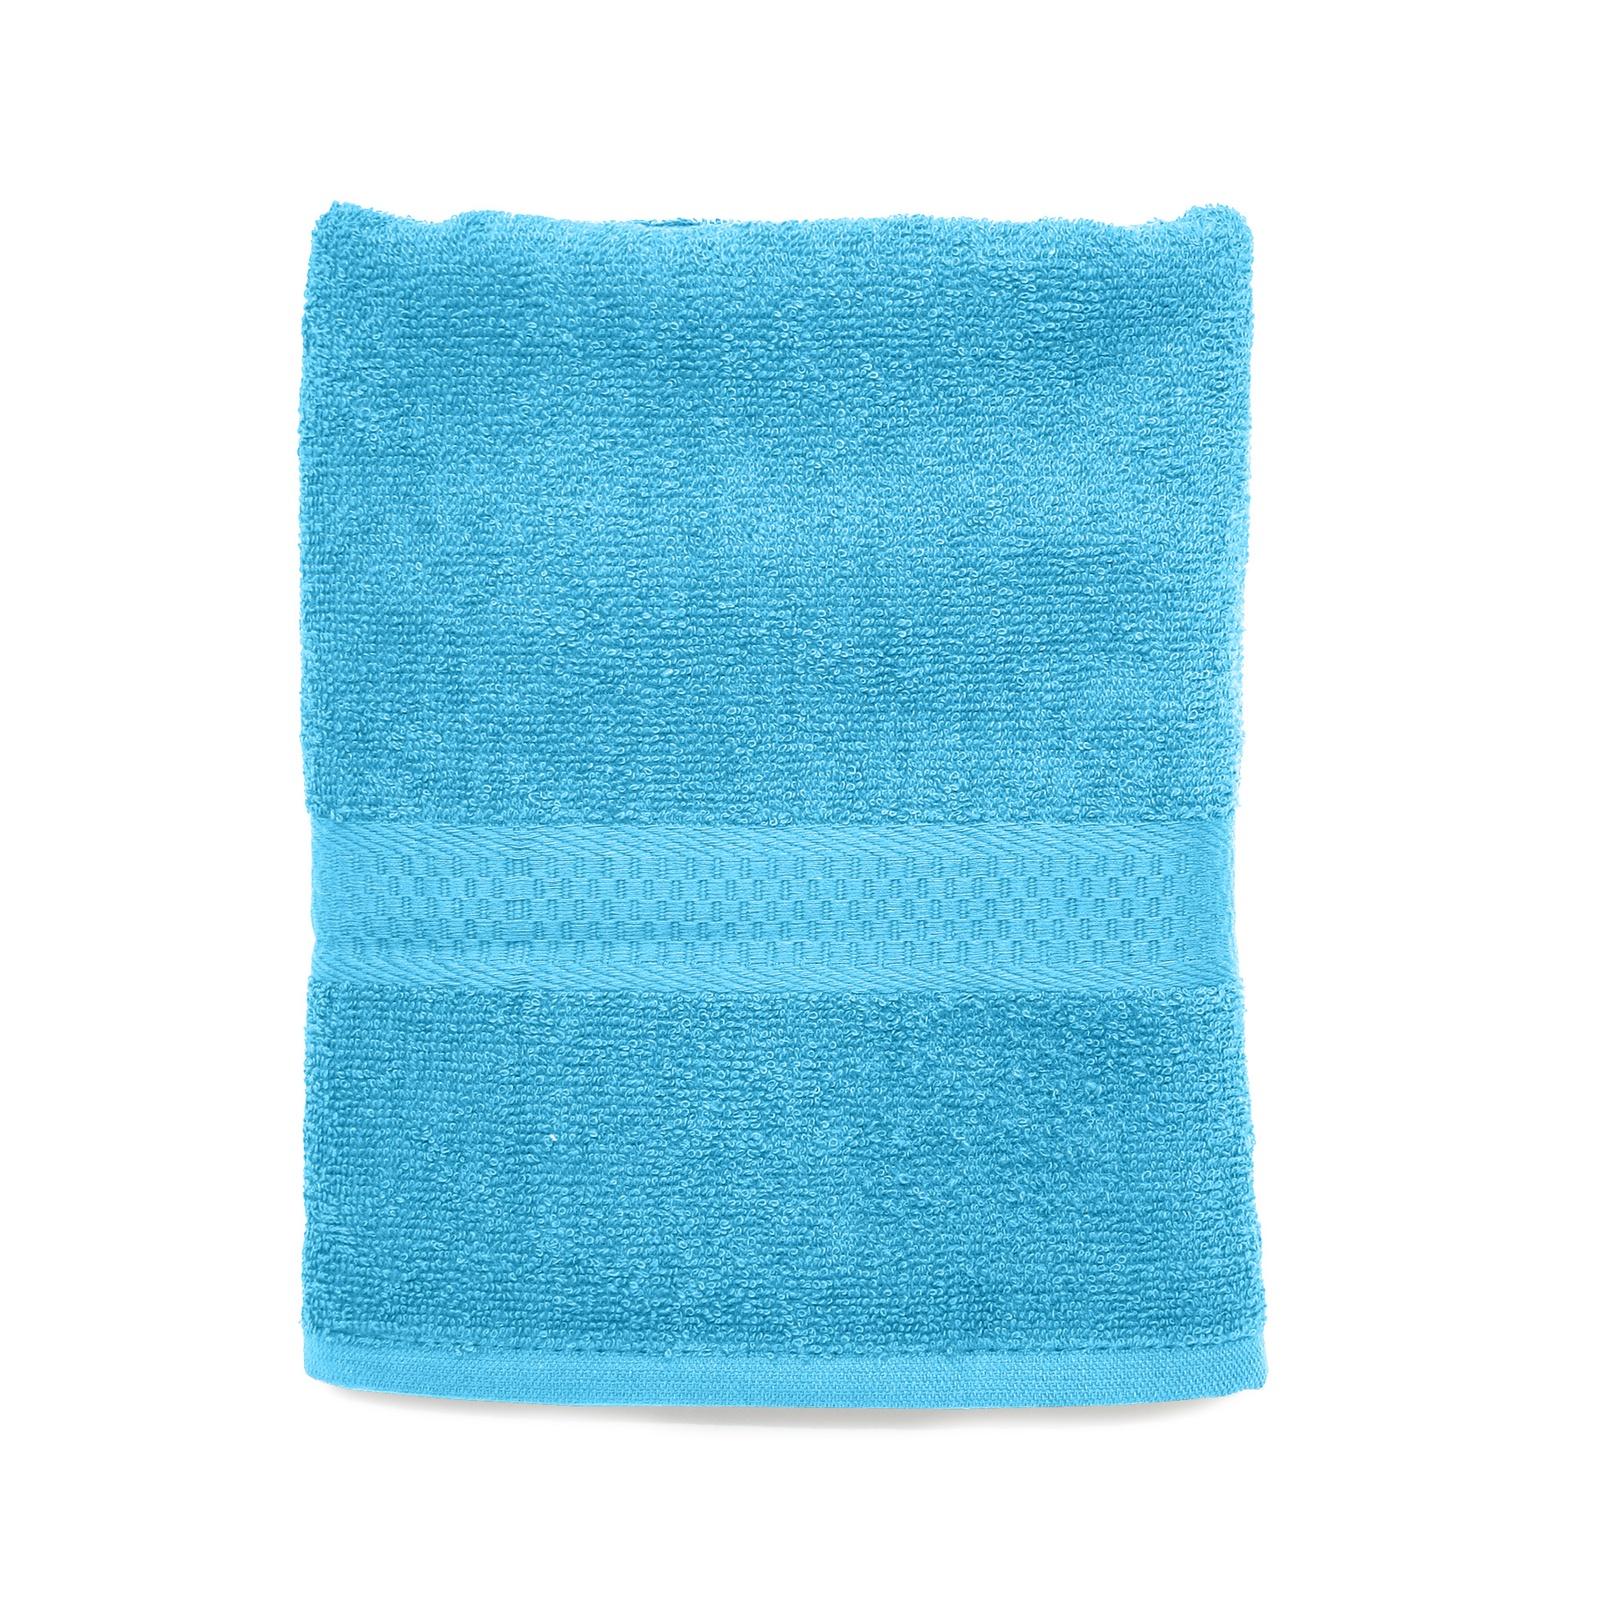 Полотенце банное Spany, 21311318189, махровое, голубой, 70 х 130 см полотенца william roberts полотенце банное aberdeen цвет queen shadow серо голубой 70х140 см